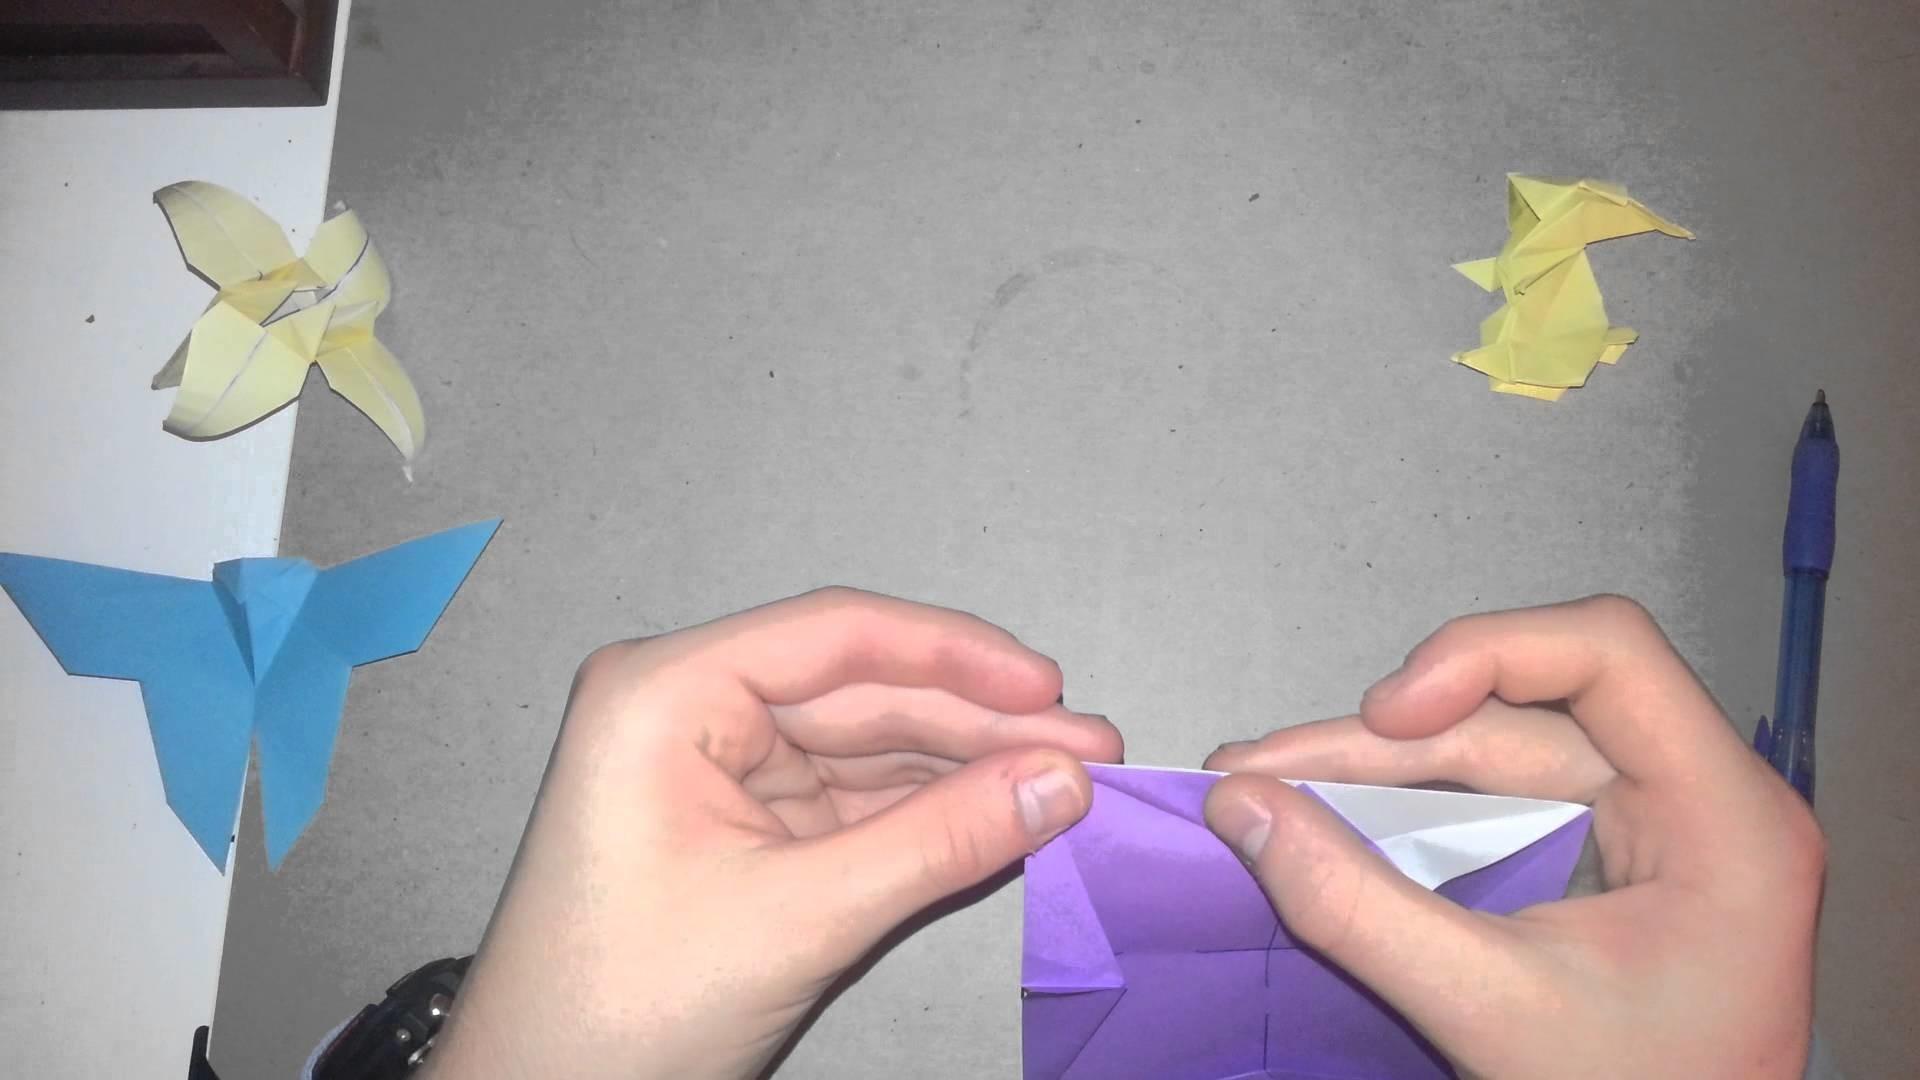 Origami Tutorial - How to Fold A Rabbit Pt. 1 (Jun Maekawa)